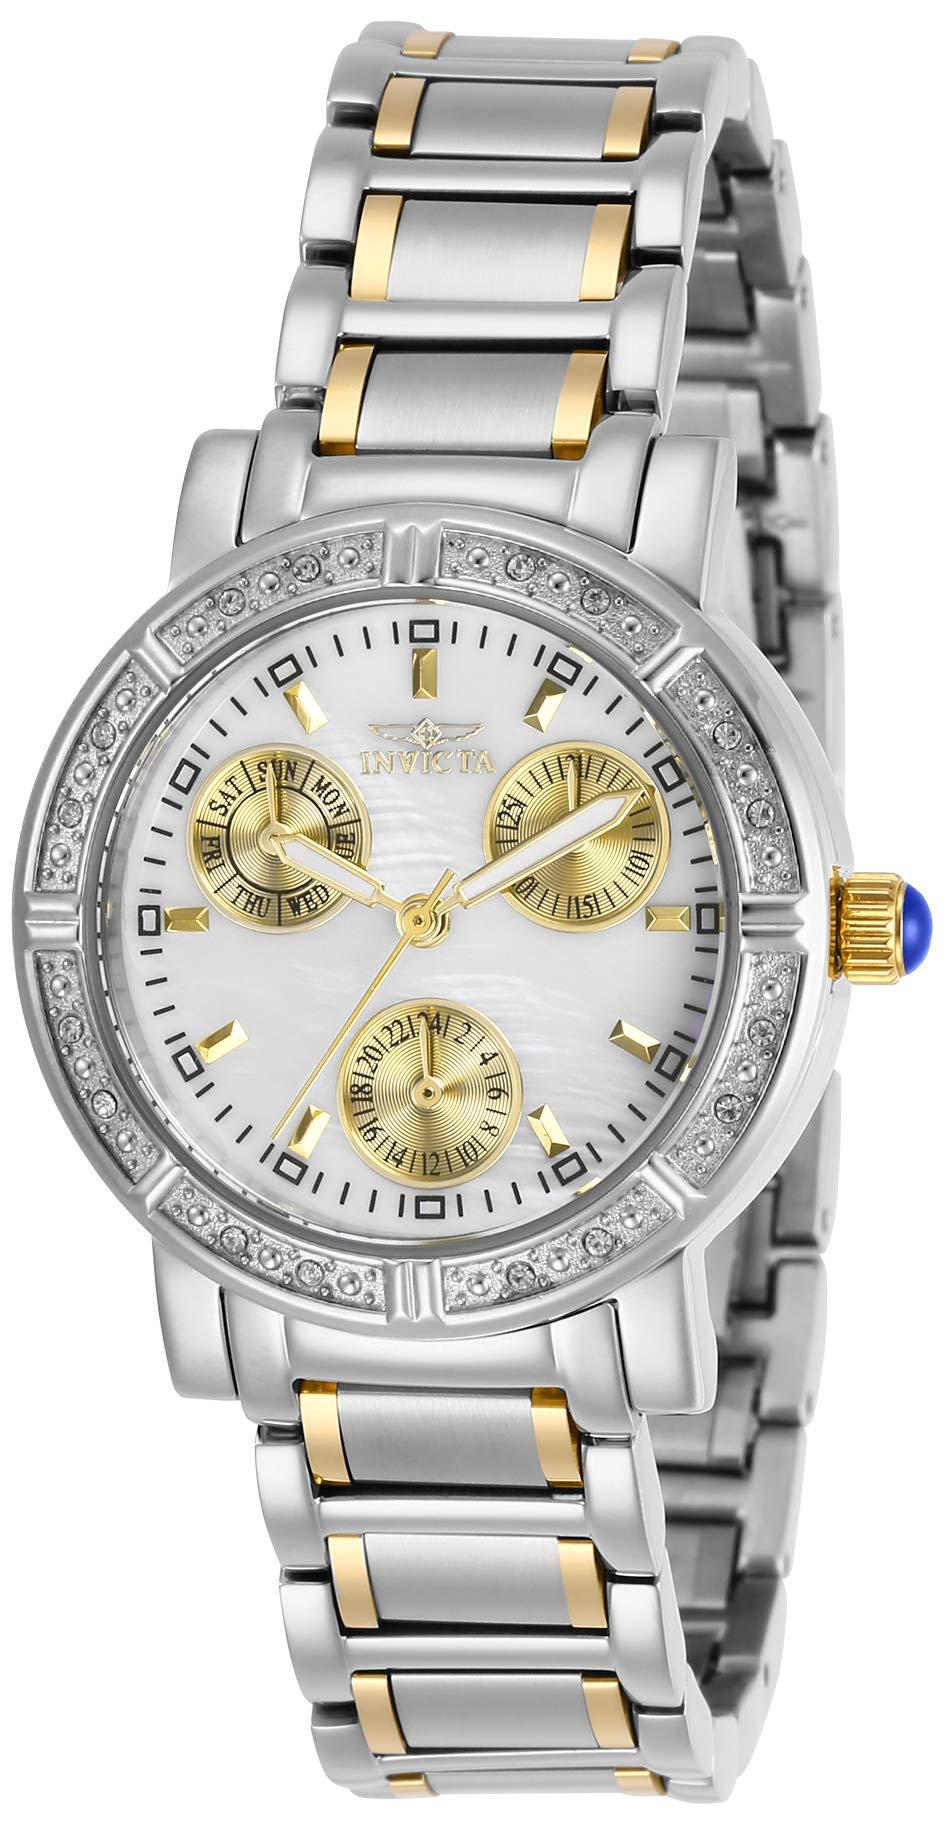 ویکالا · خرید  اصل اورجینال · خرید از آمازون · Invicta Women's Angel Quartz Stainless-Steel Strap, Two Tone, 16 Casual Watch (Model: 29117) wekala · ویکالا